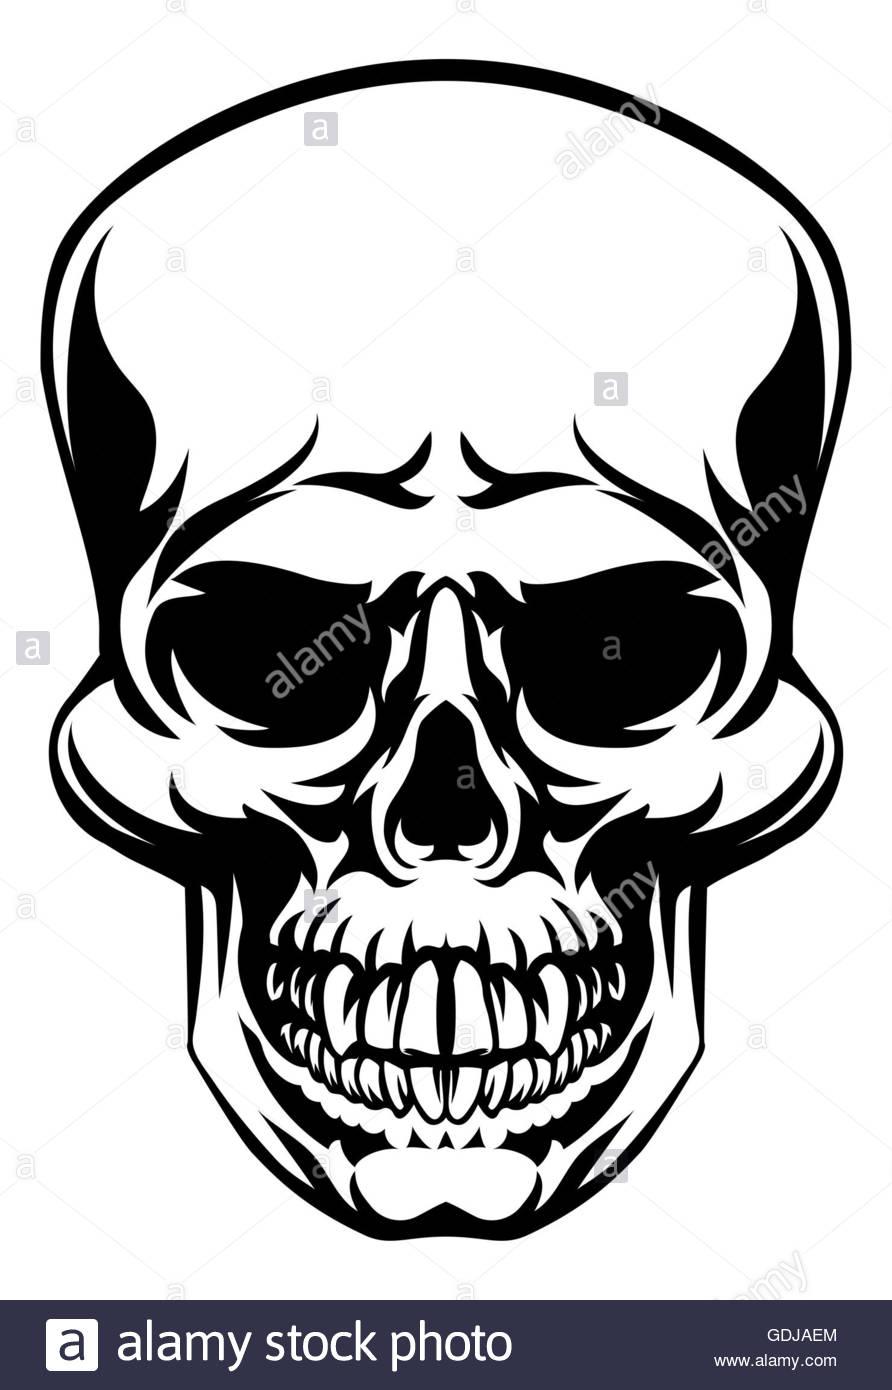 892x1390 A Skull Scary Skull Design Drawing Stock Photo 111656124